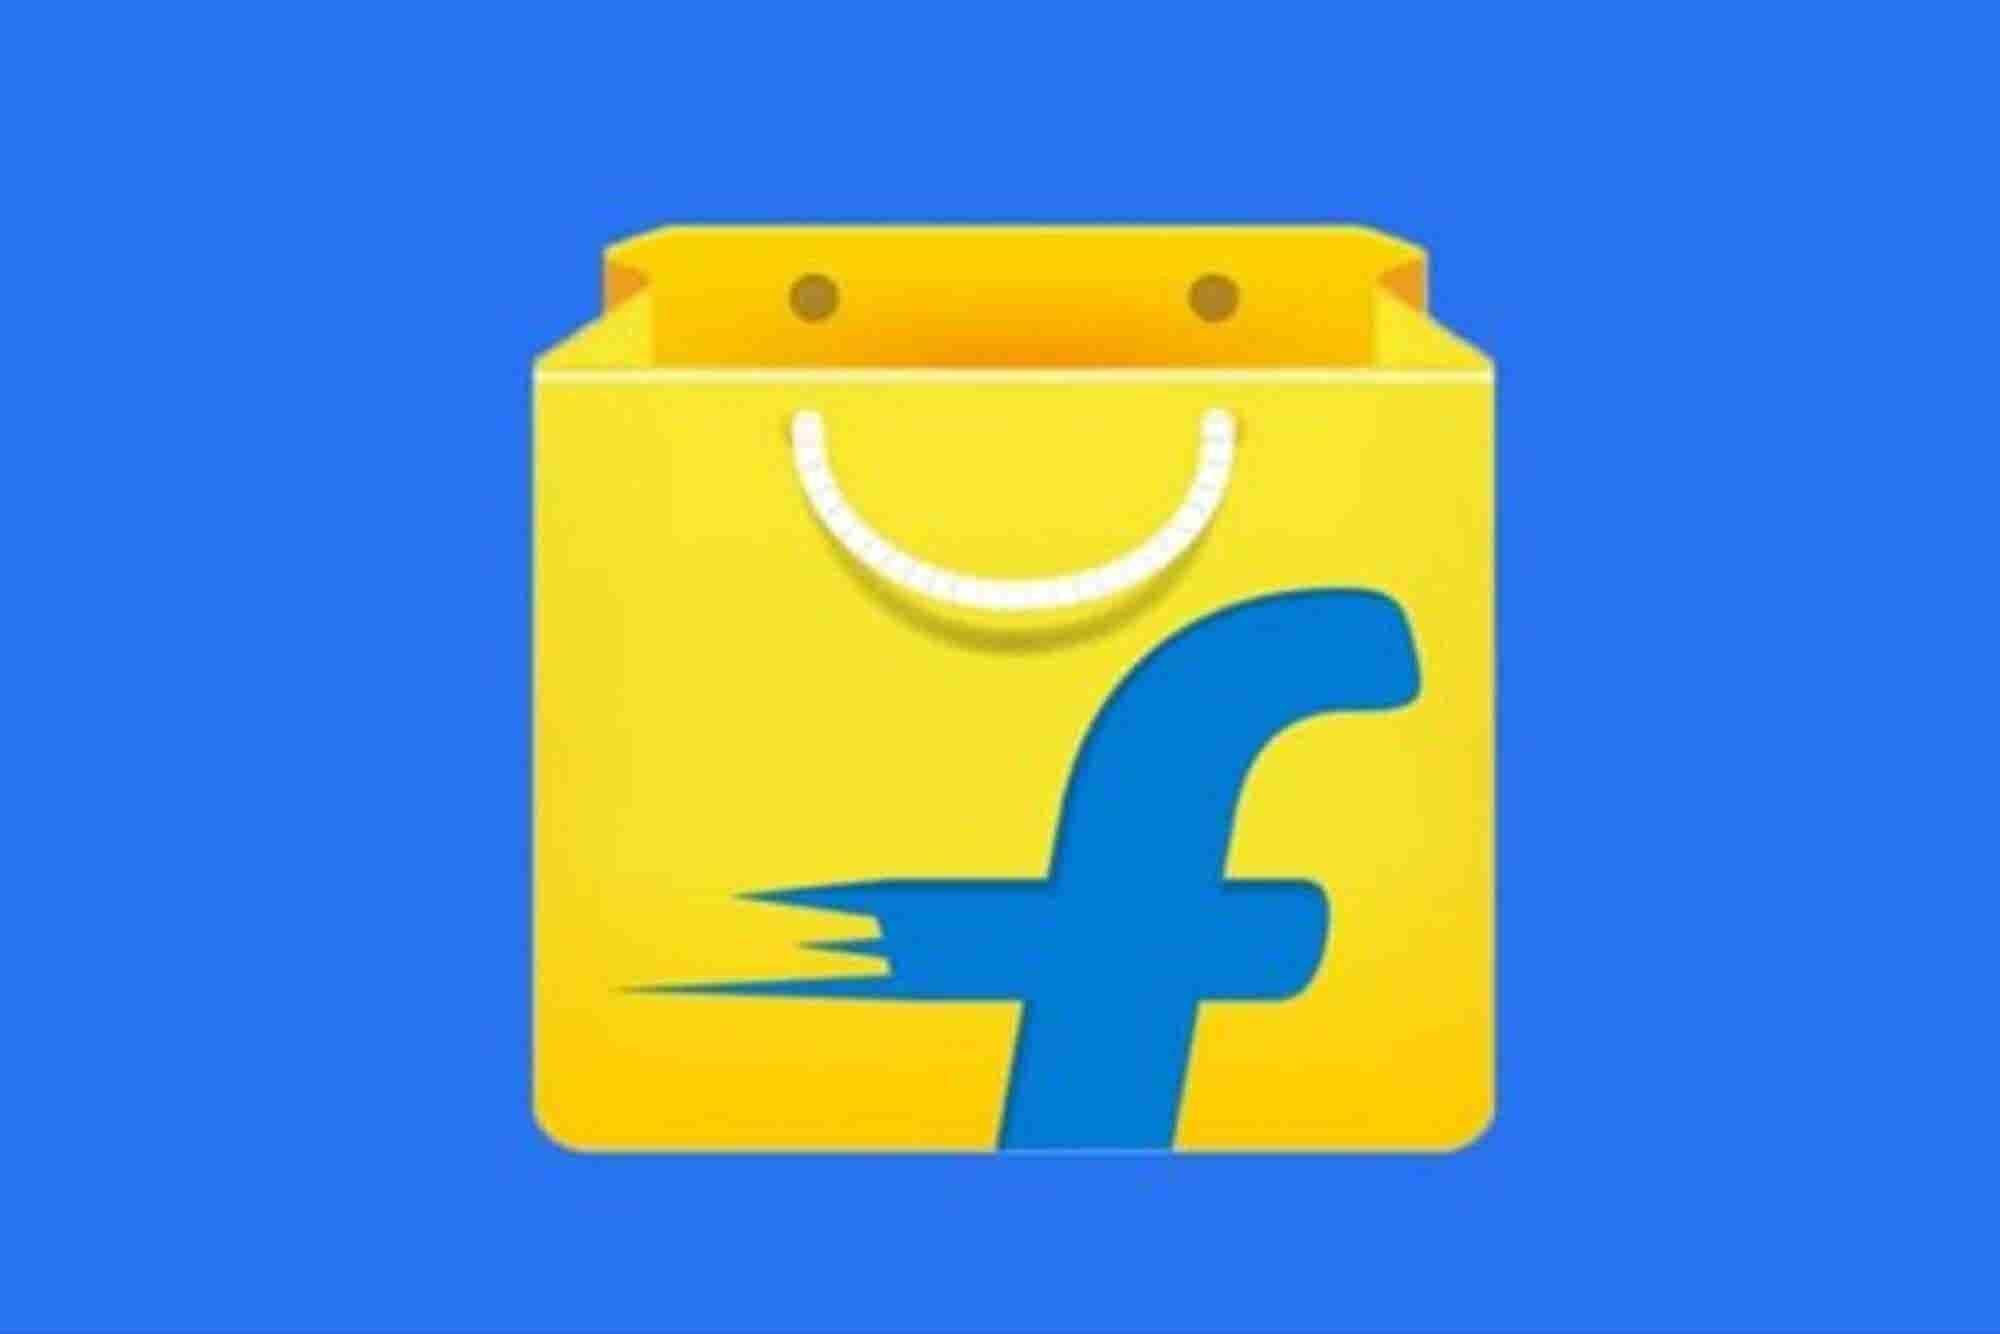 Flipkart Seeking NBFC License; Soon to Venture into Fintech Space